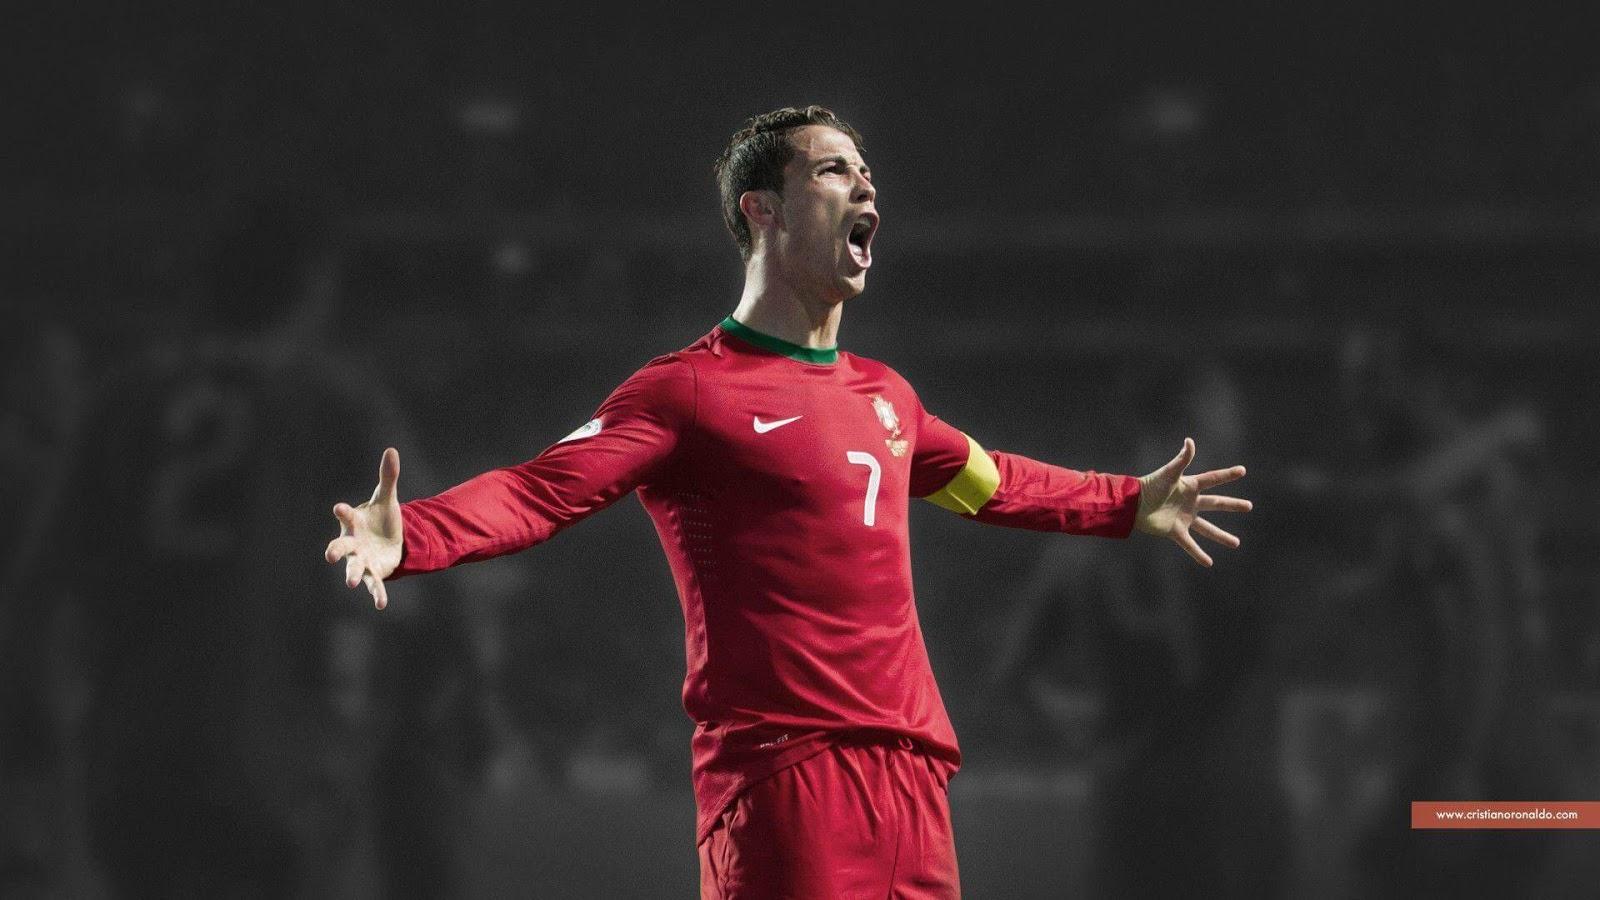 ronaldo hd wallpapers football